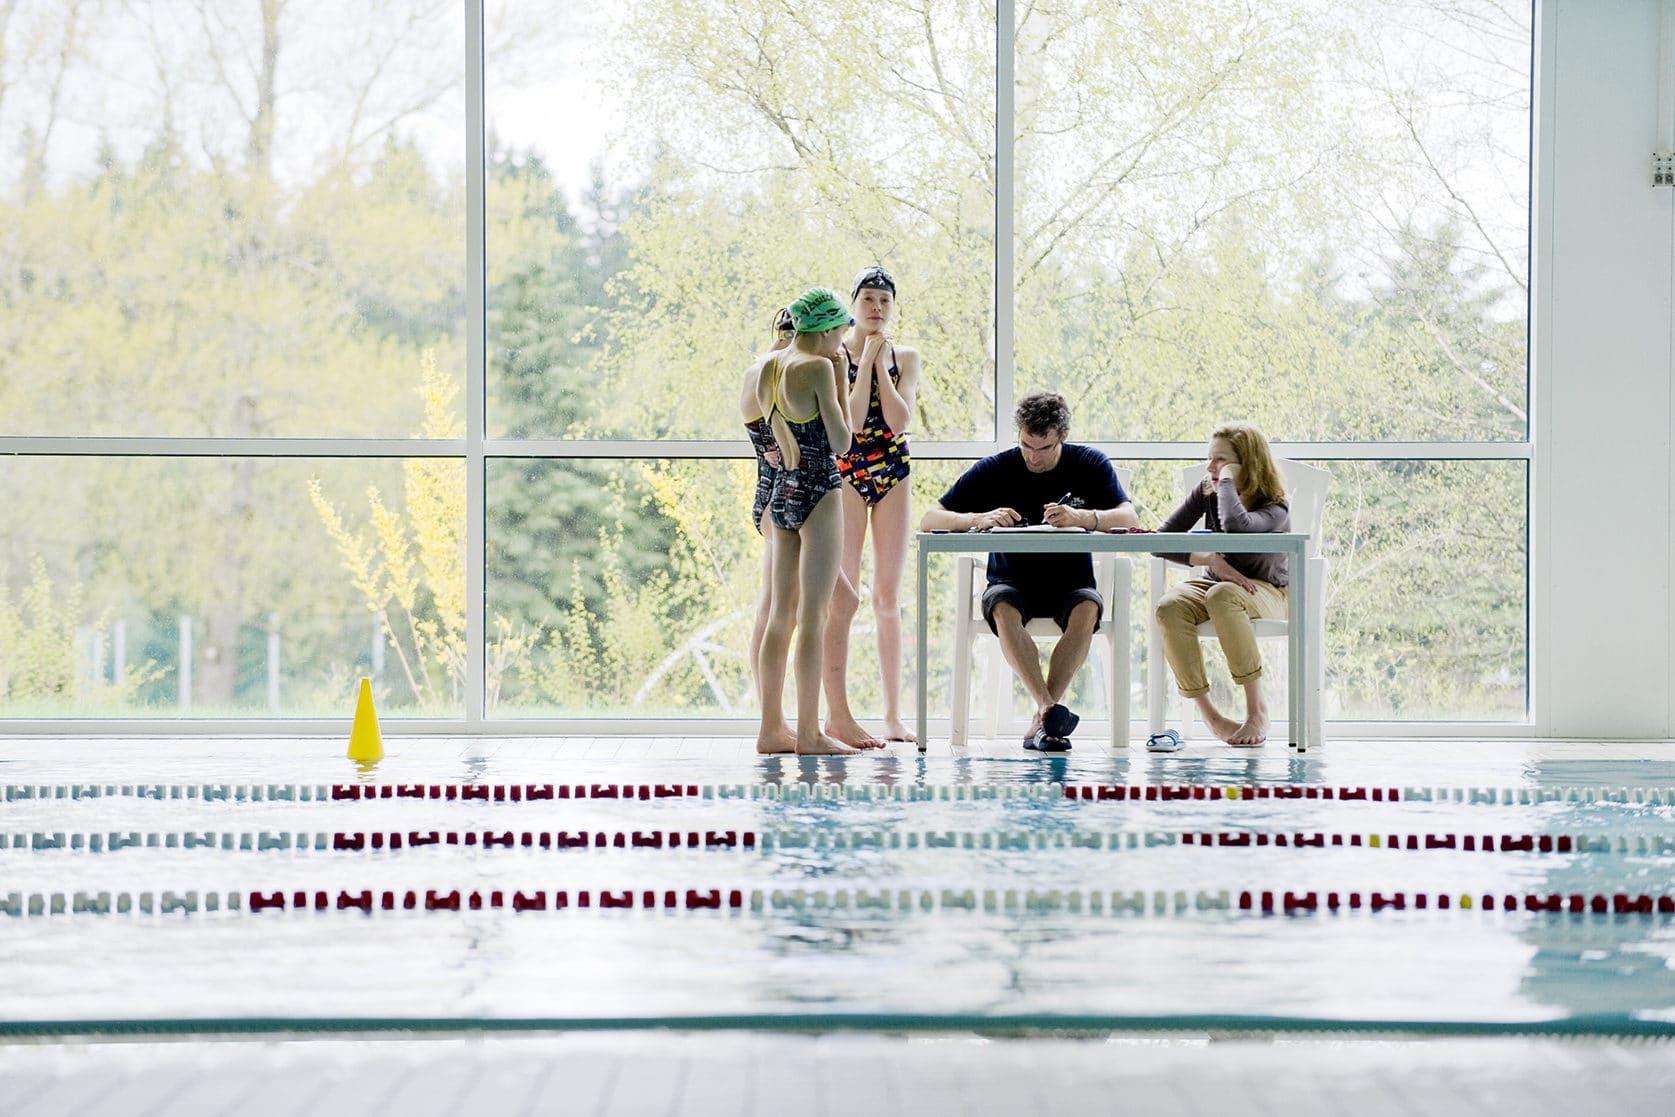 Schwimmhalle Sportpark Erzgebirge Trainingslager